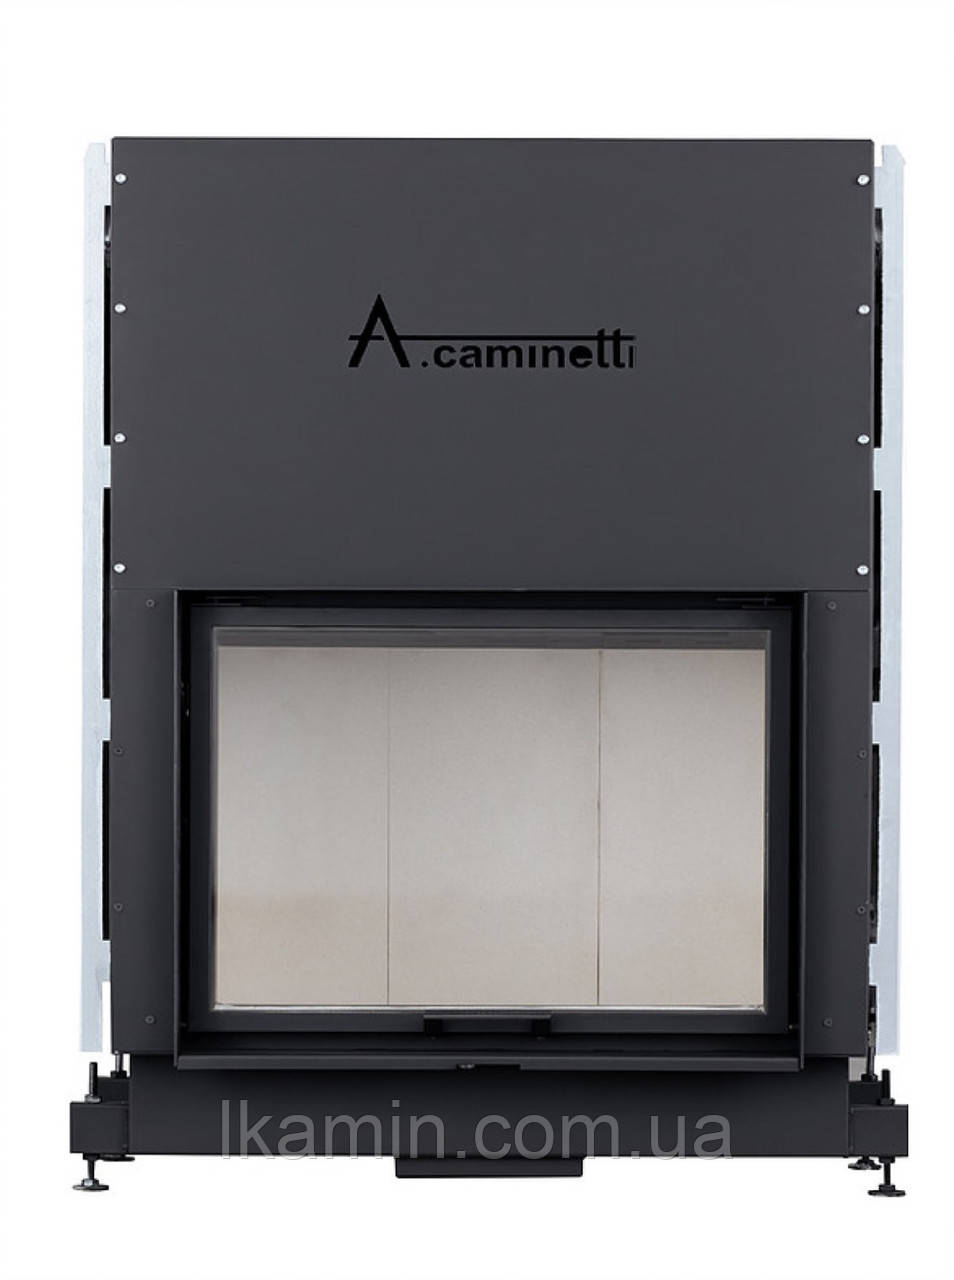 Каминная топка A.caminetti FLAT 90 X 50